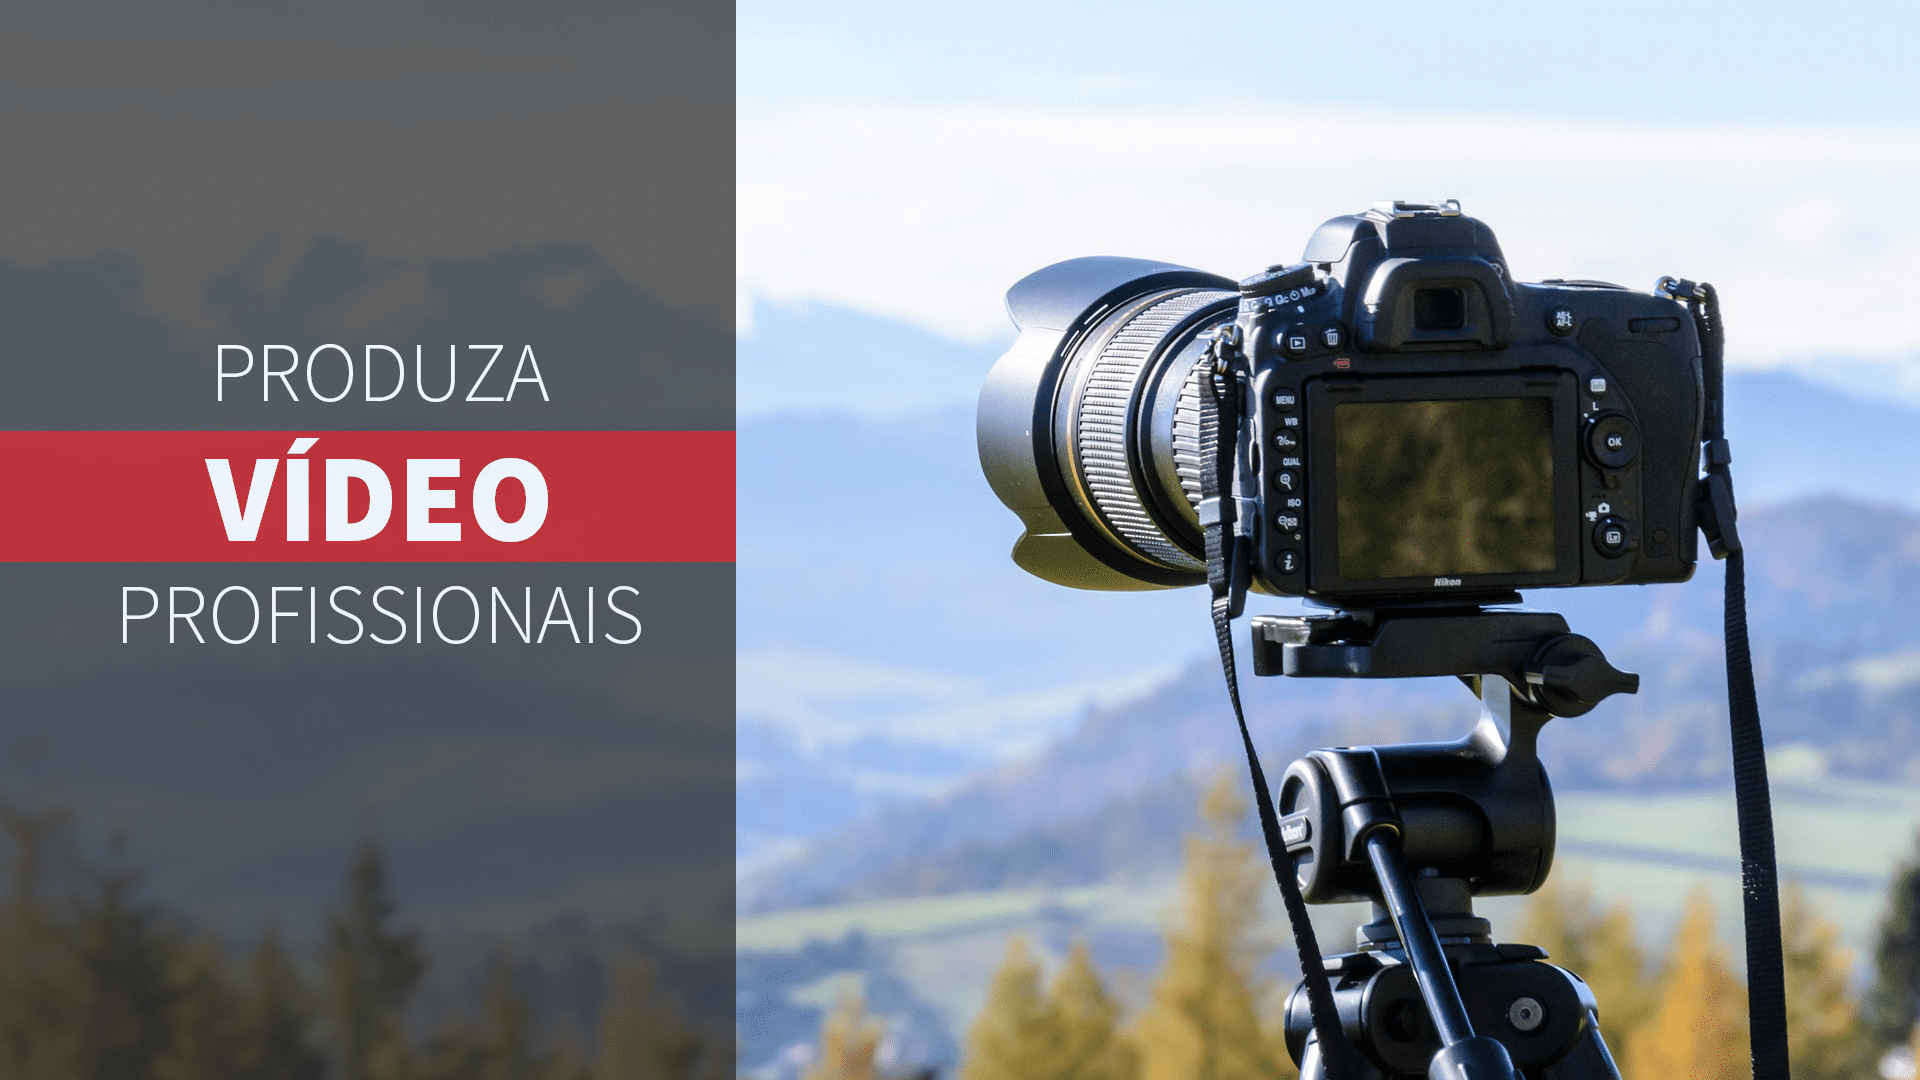 Produzir Vídeos Profissionais